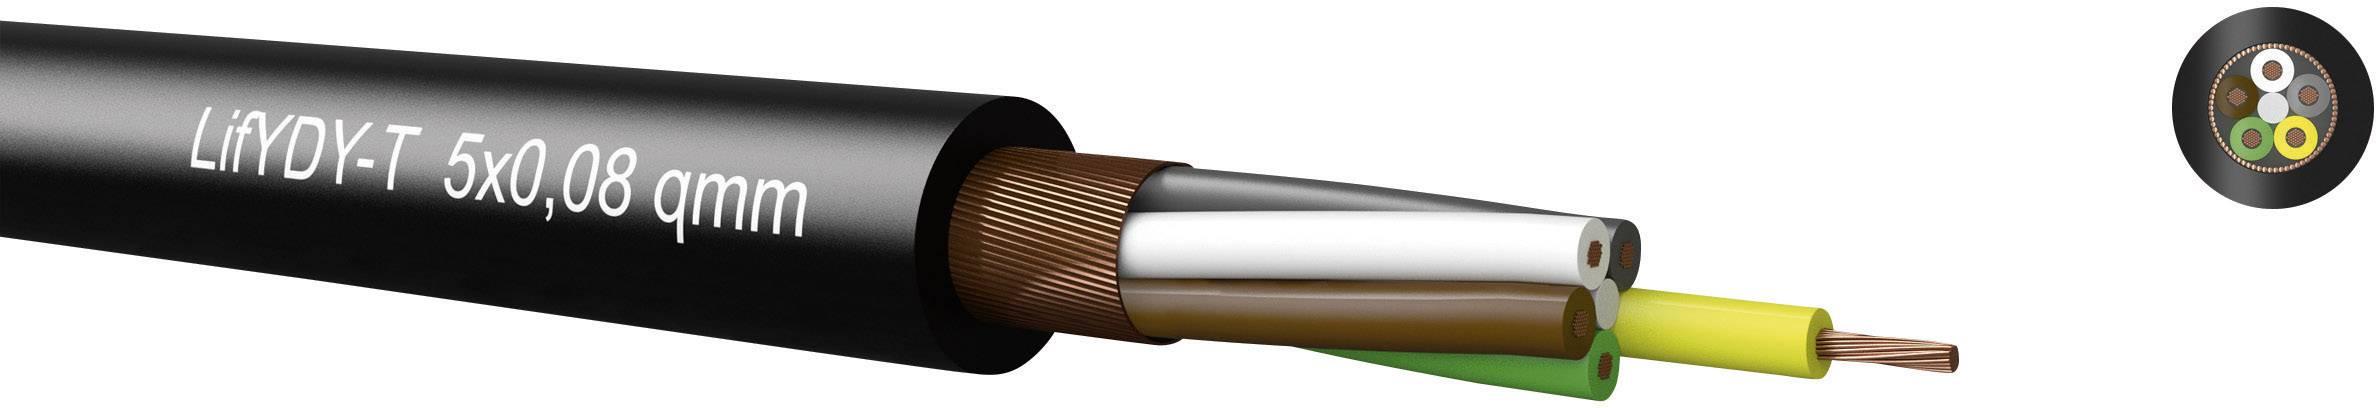 Riadiaci kábel Kabeltronik LifYDY 350800800, 8 x 0.08 mm², vonkajší Ø 4.30 mm, 300 V, metrový tovar, čierna